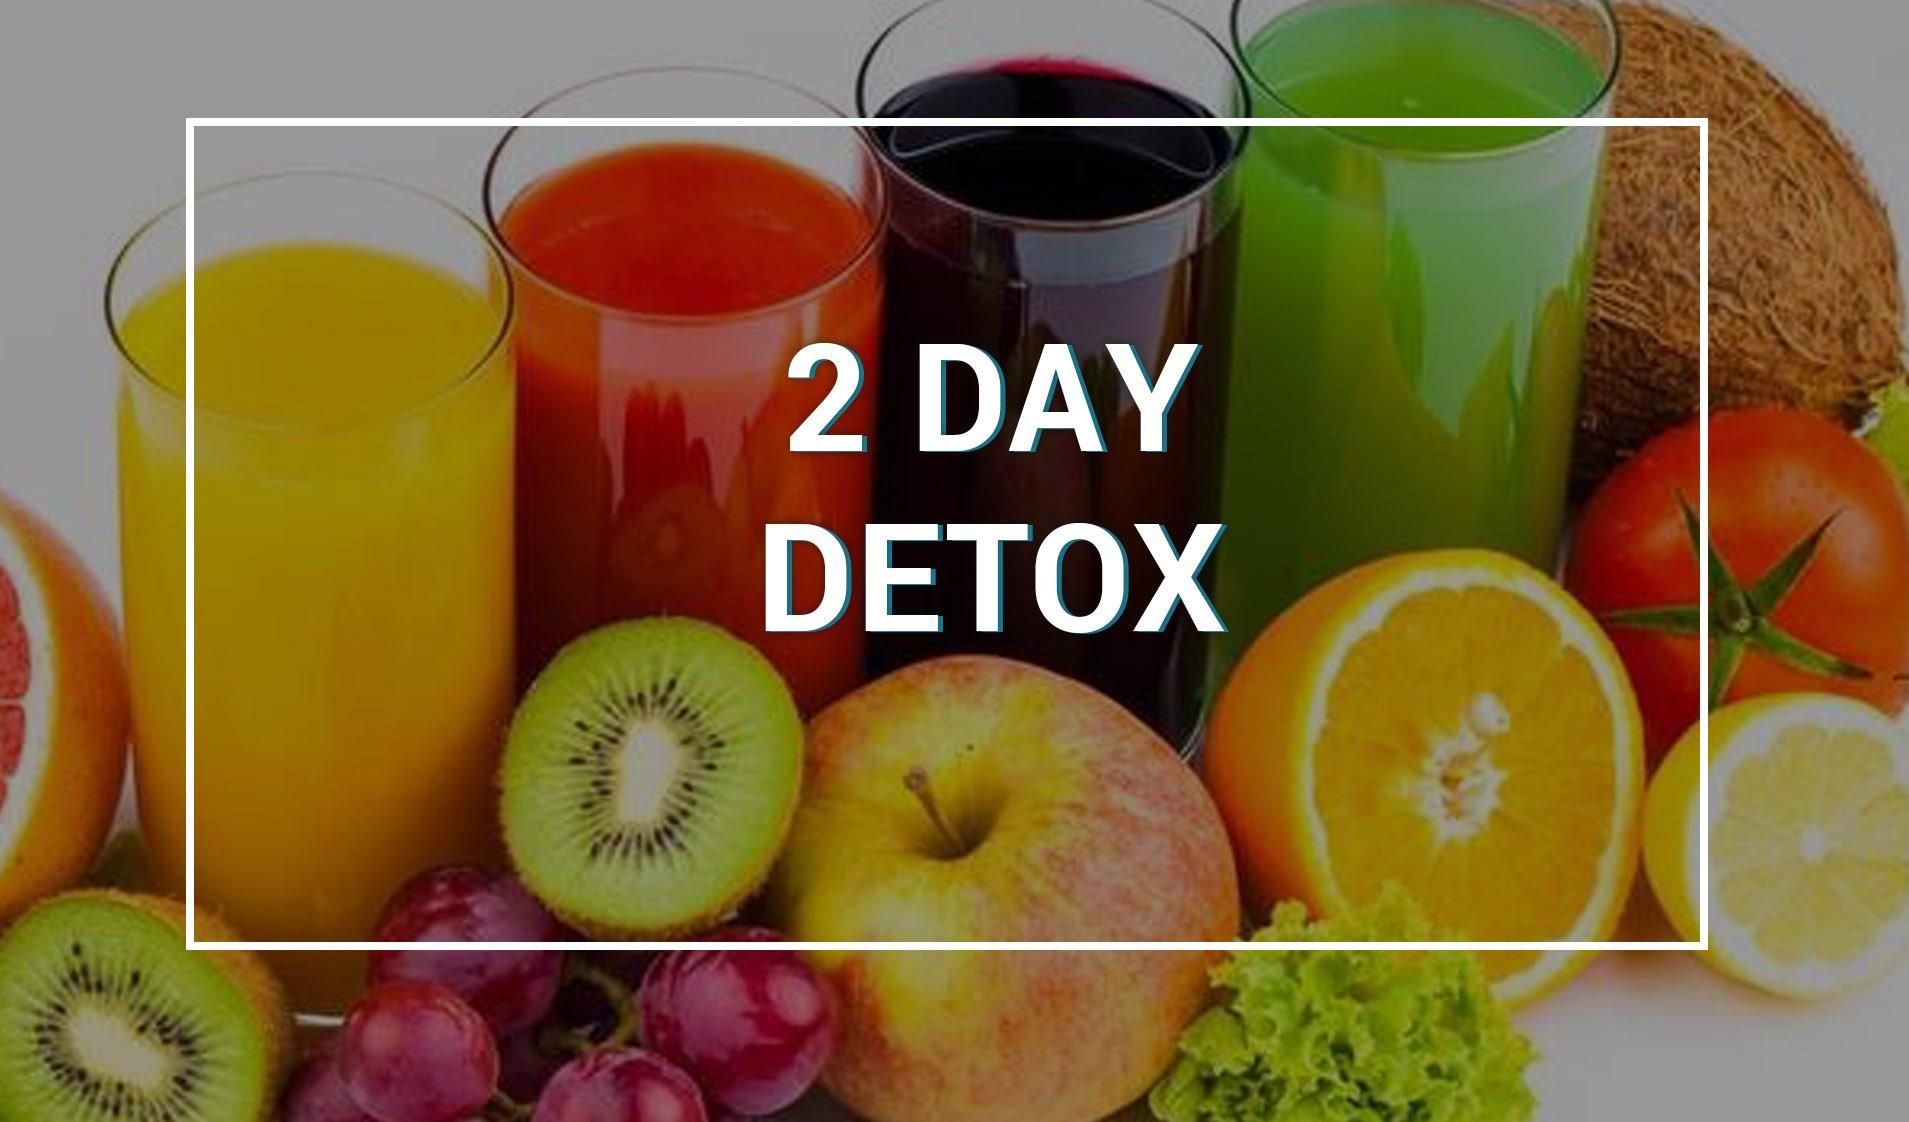 2 day detox22